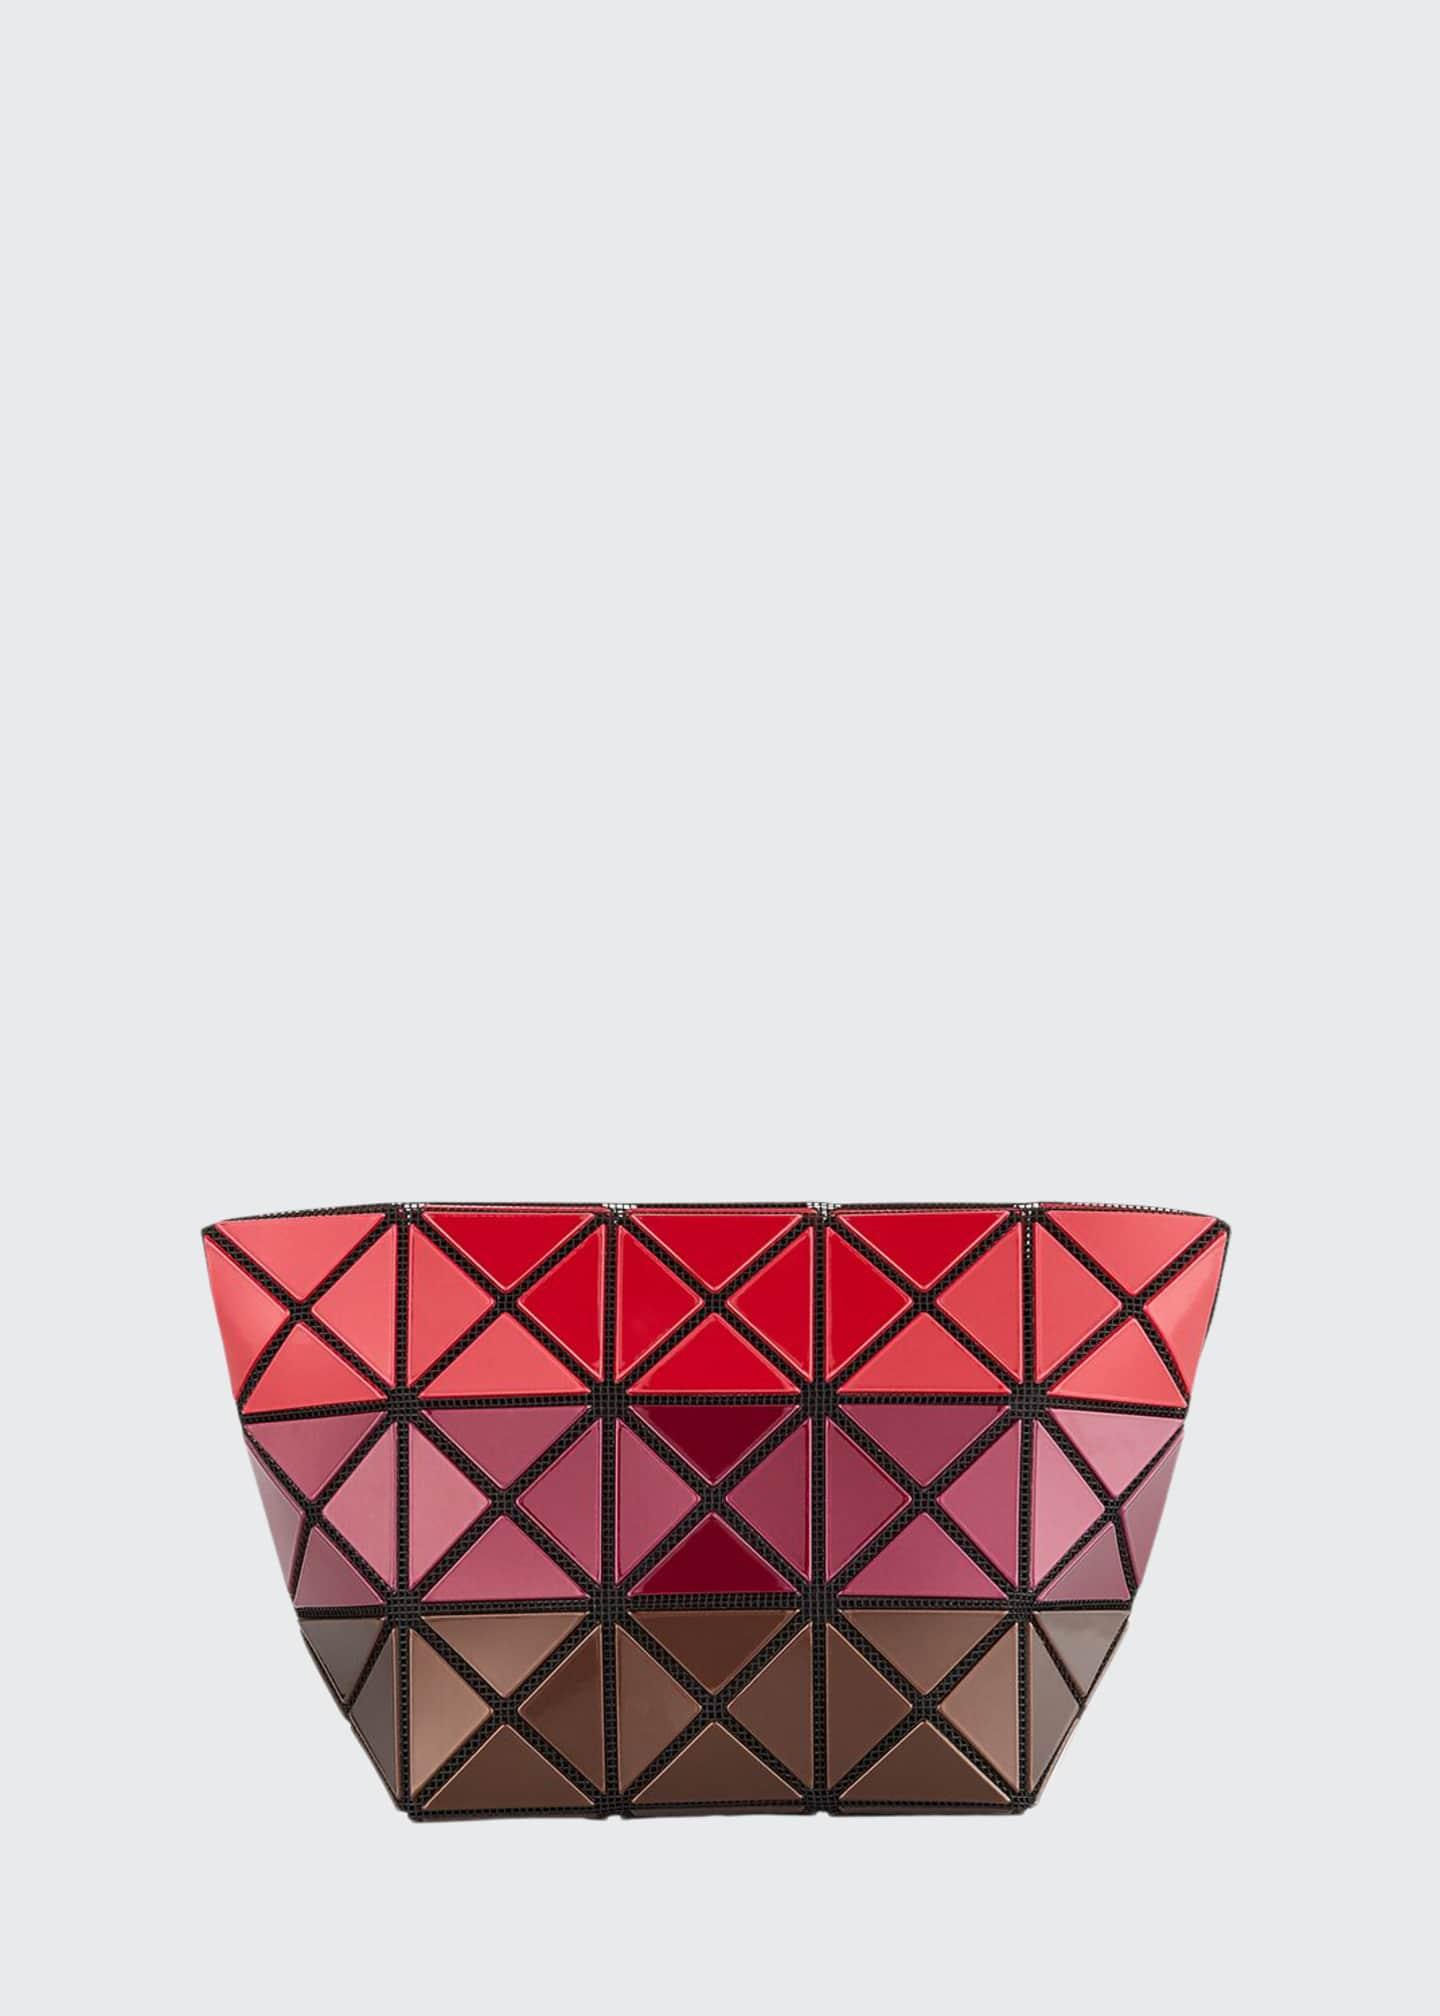 BAO BAO ISSEY MIYAKE Prism Metallic Stripe Clutch